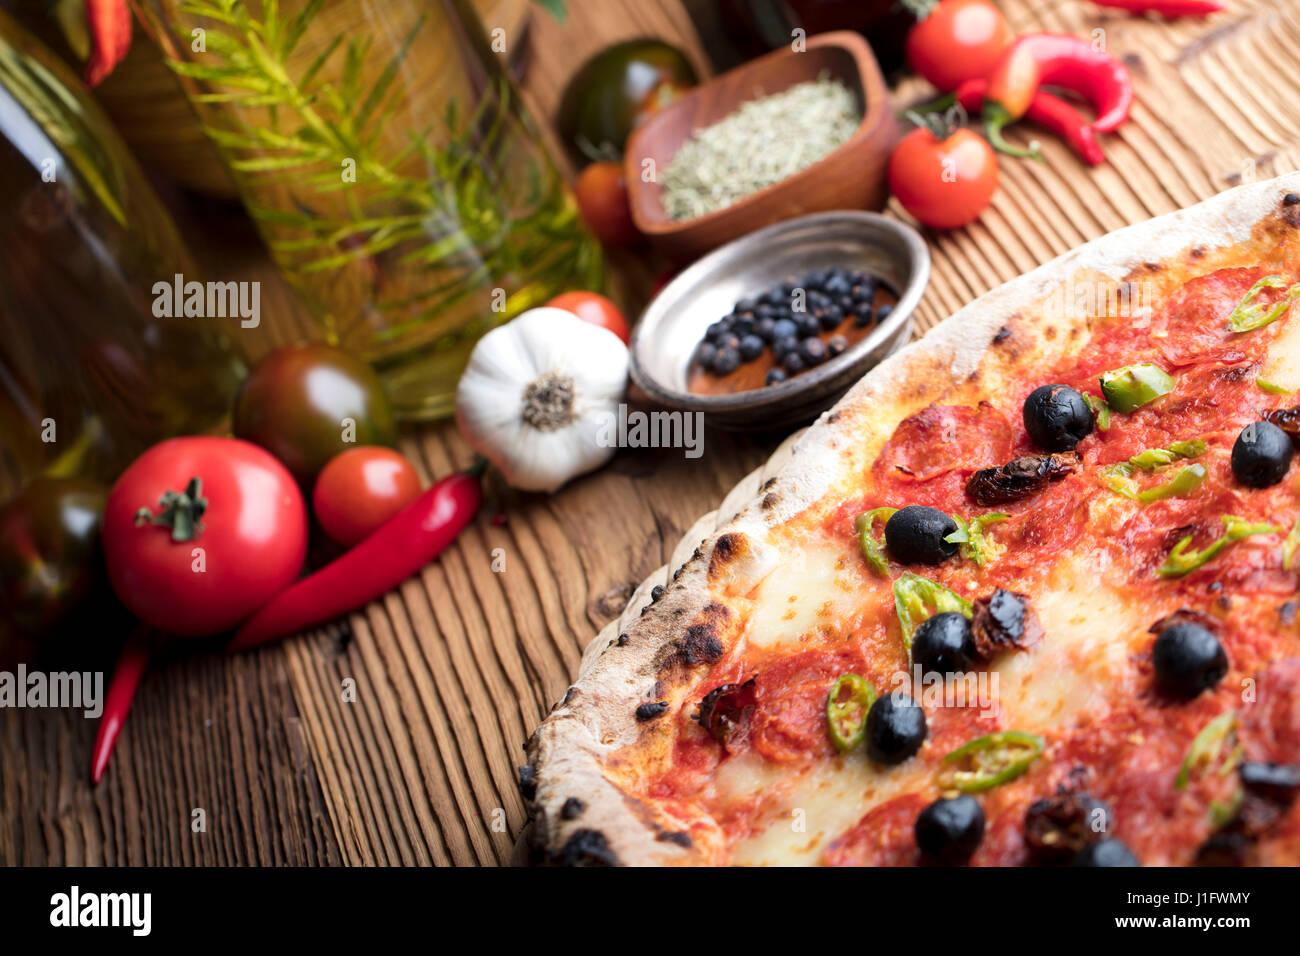 Concepto de comida italiana, romero, aceite de oliva, comida sana Imagen De Stock